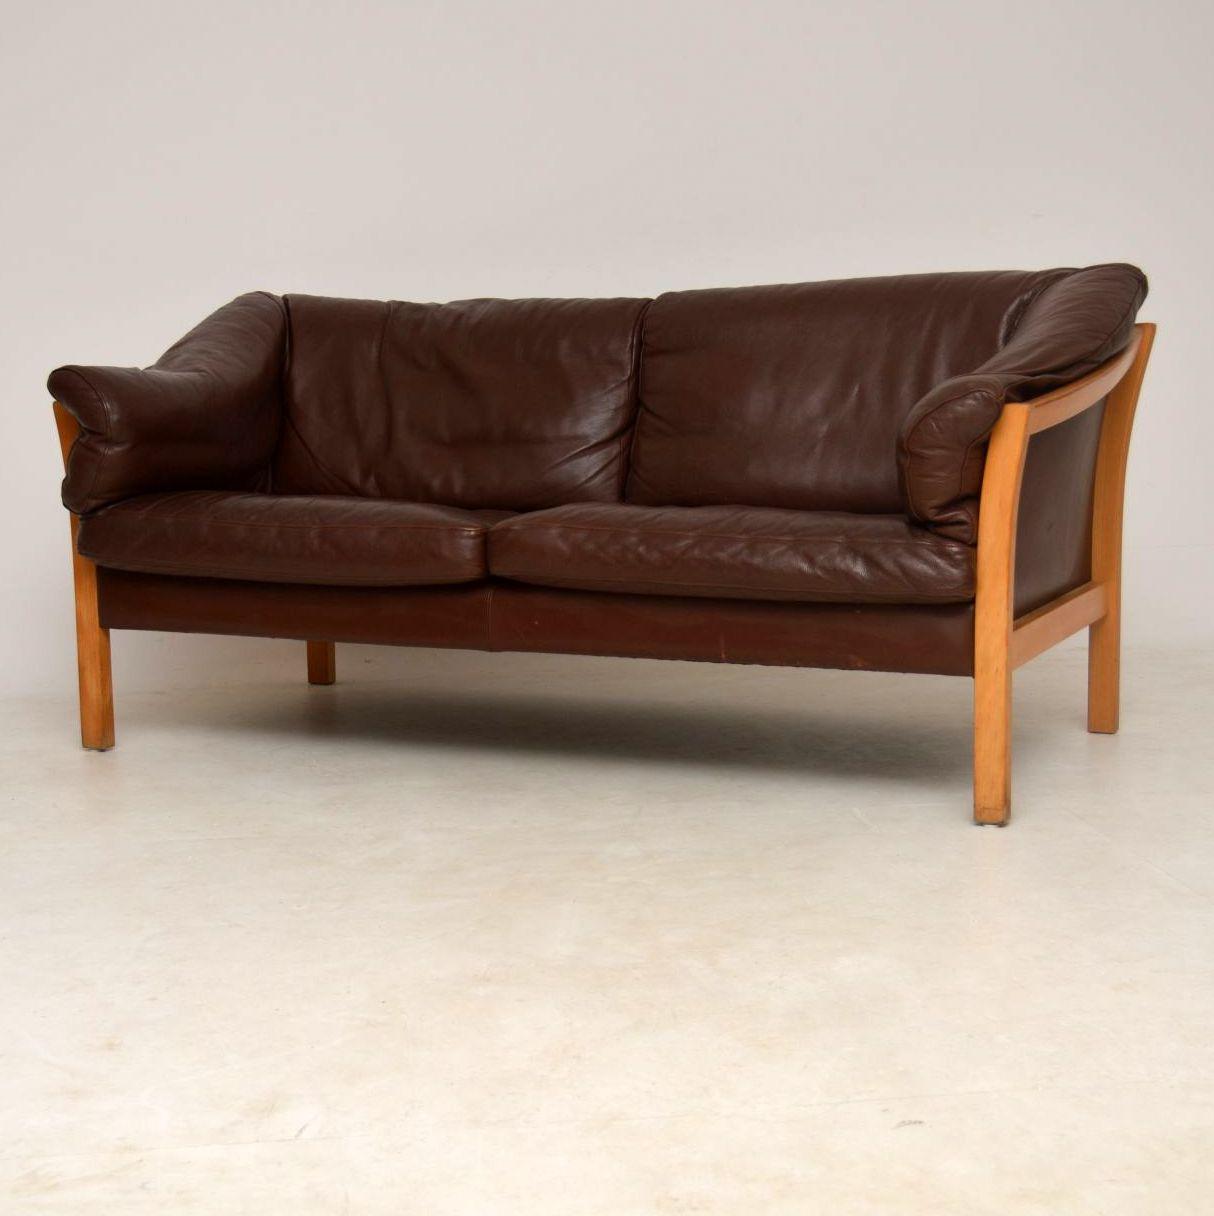 1960 S Danish Vintage Leather Sofa Retrospective